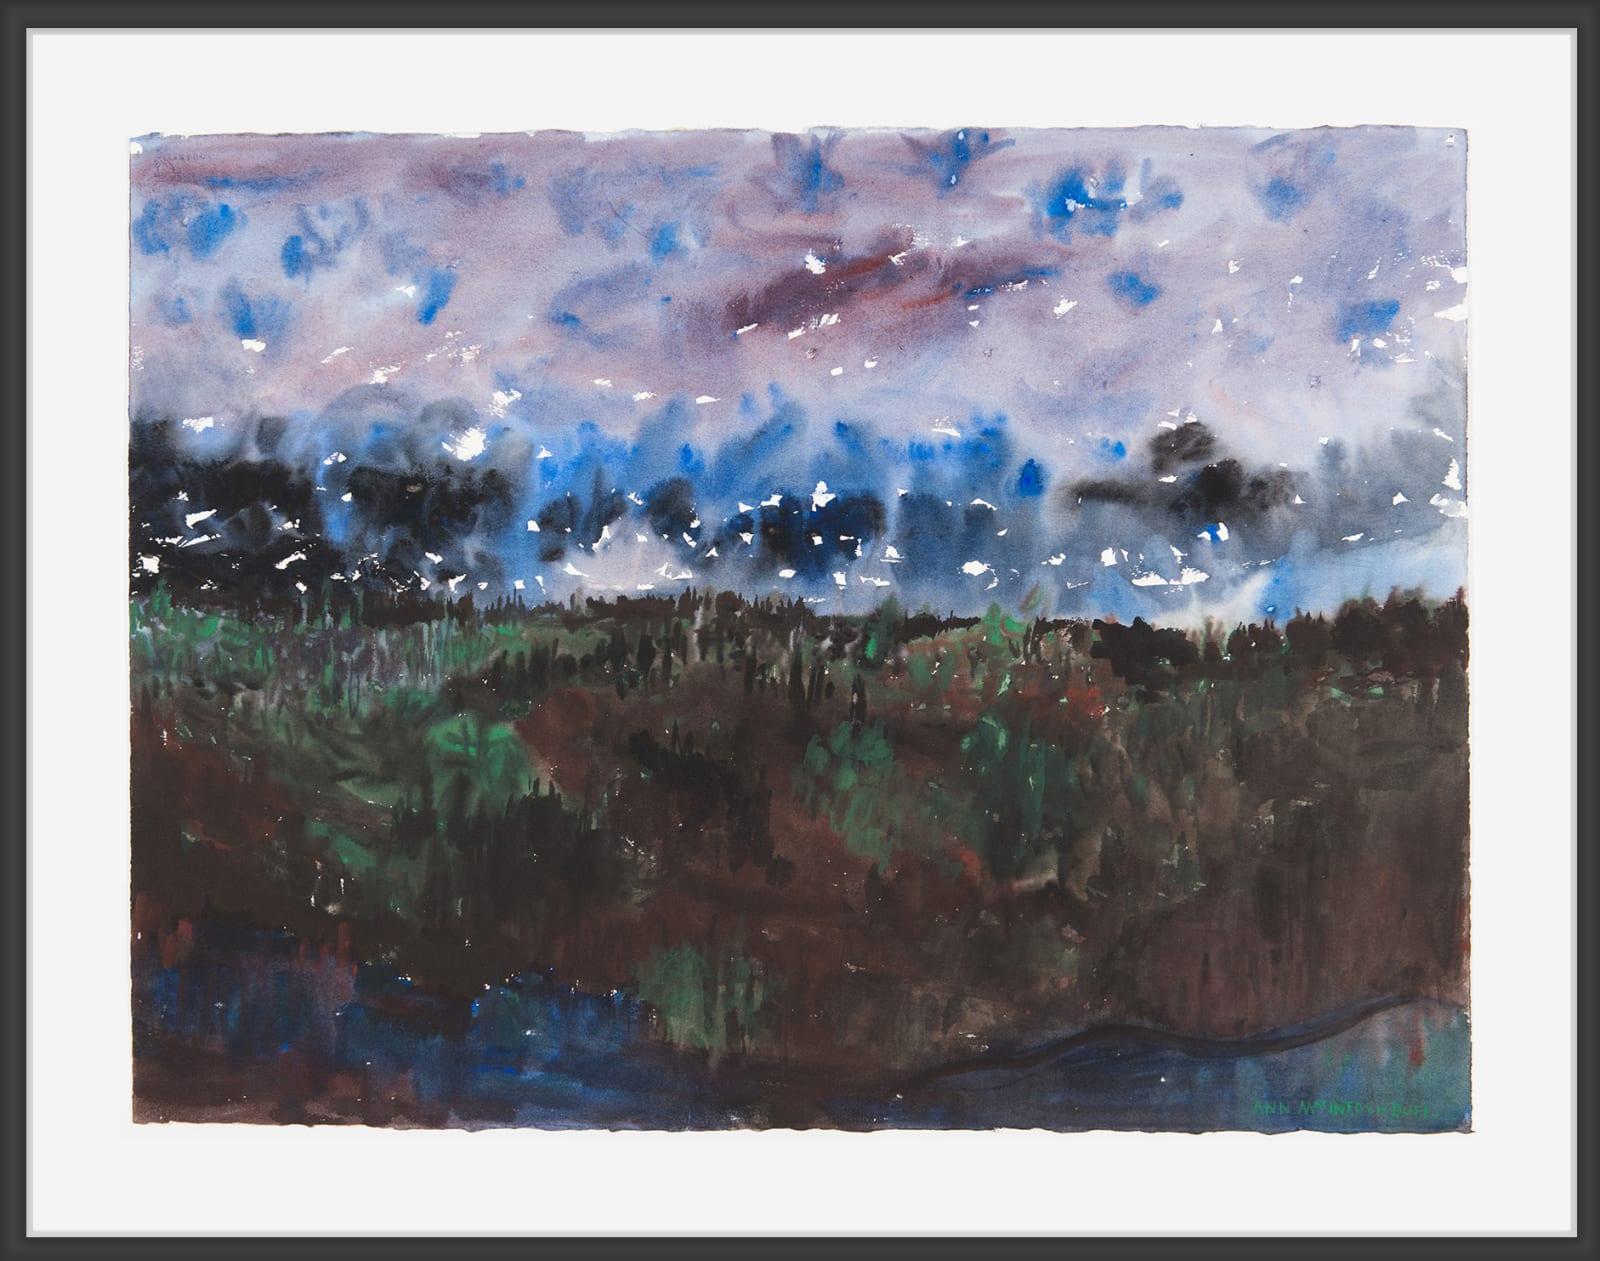 Ann MacIntosh Duff, Starry Night, c. 2000